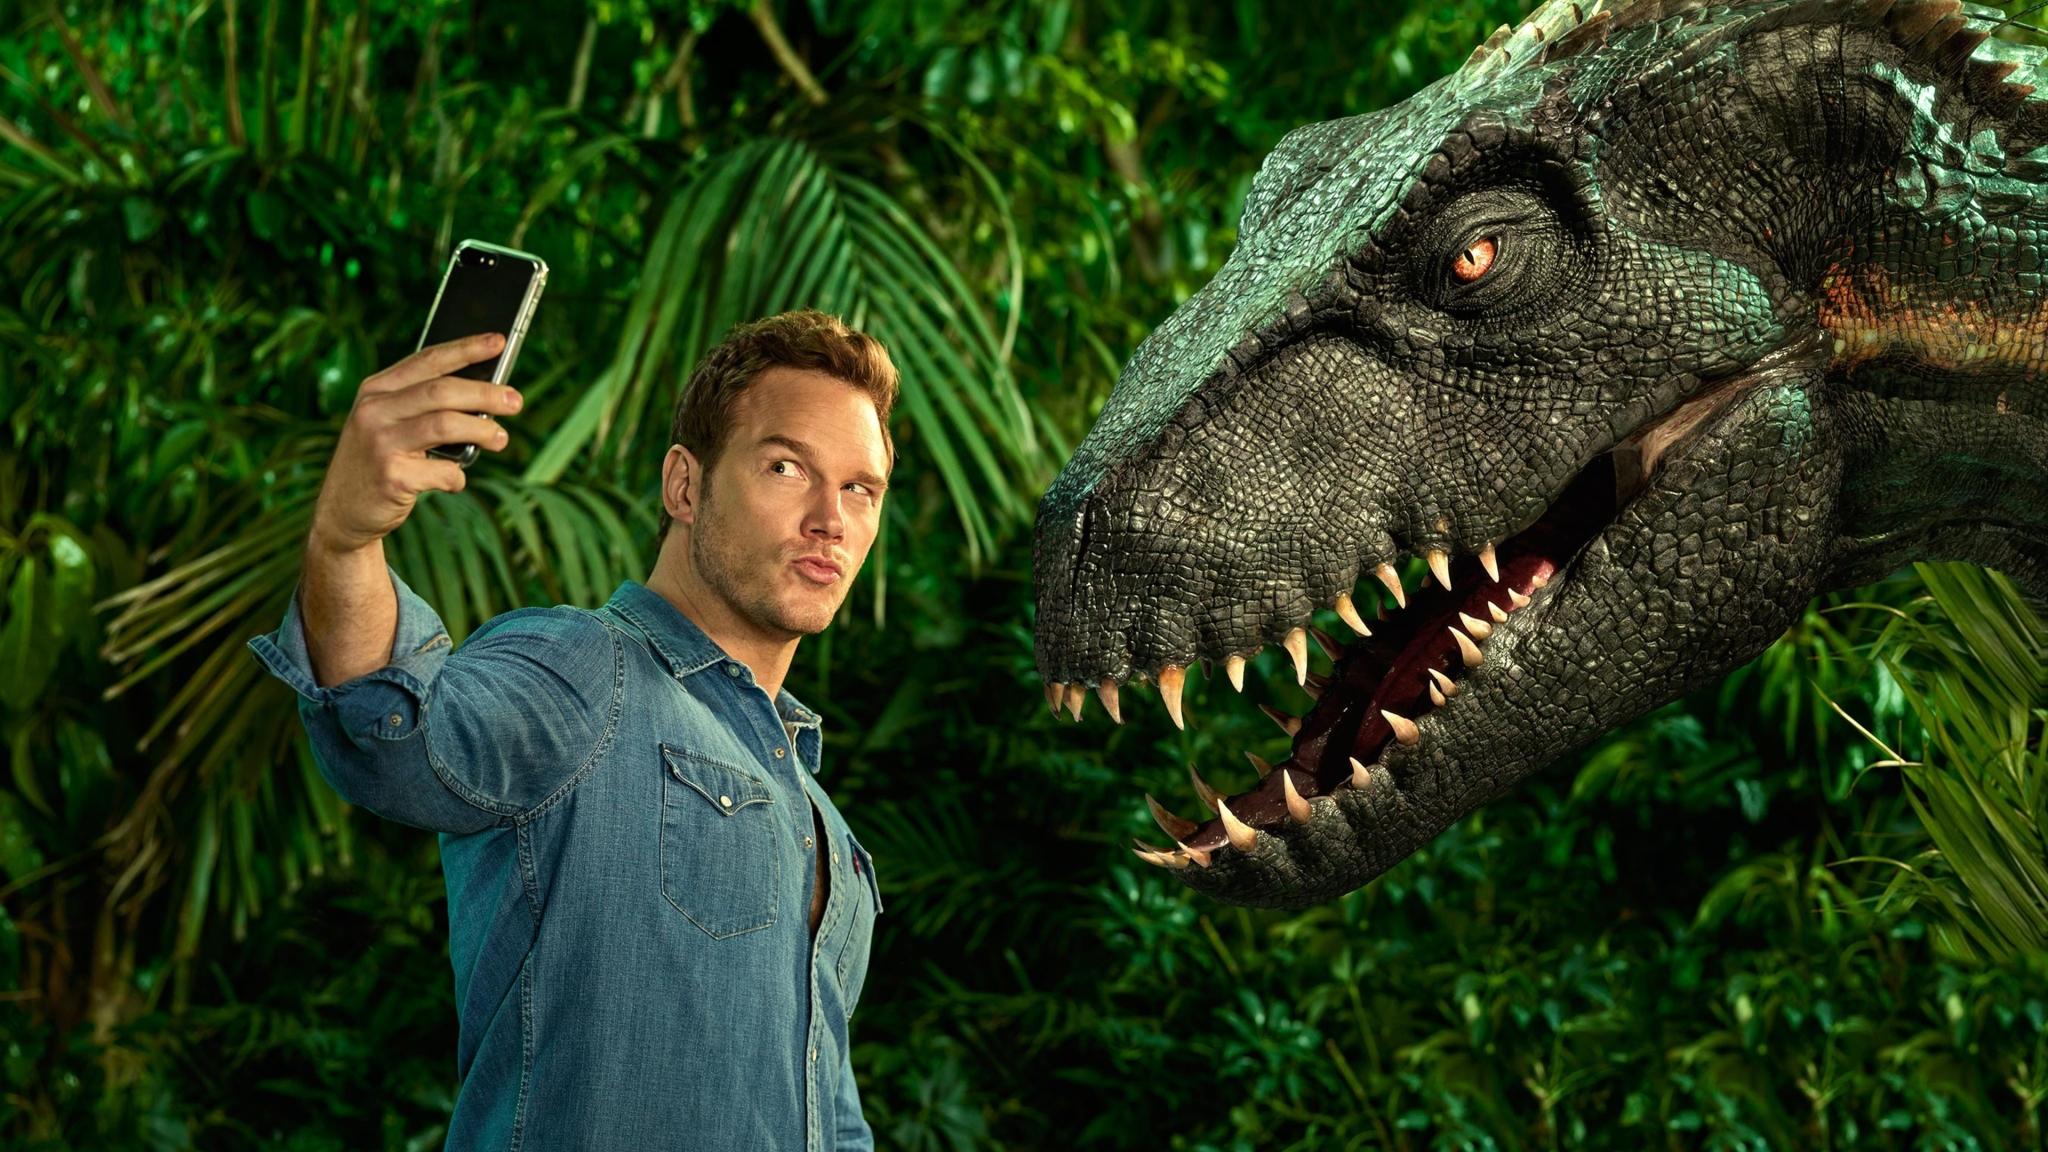 2048x1152 Chris Pratt Taking Selfie With Dinosaur 2048x1152